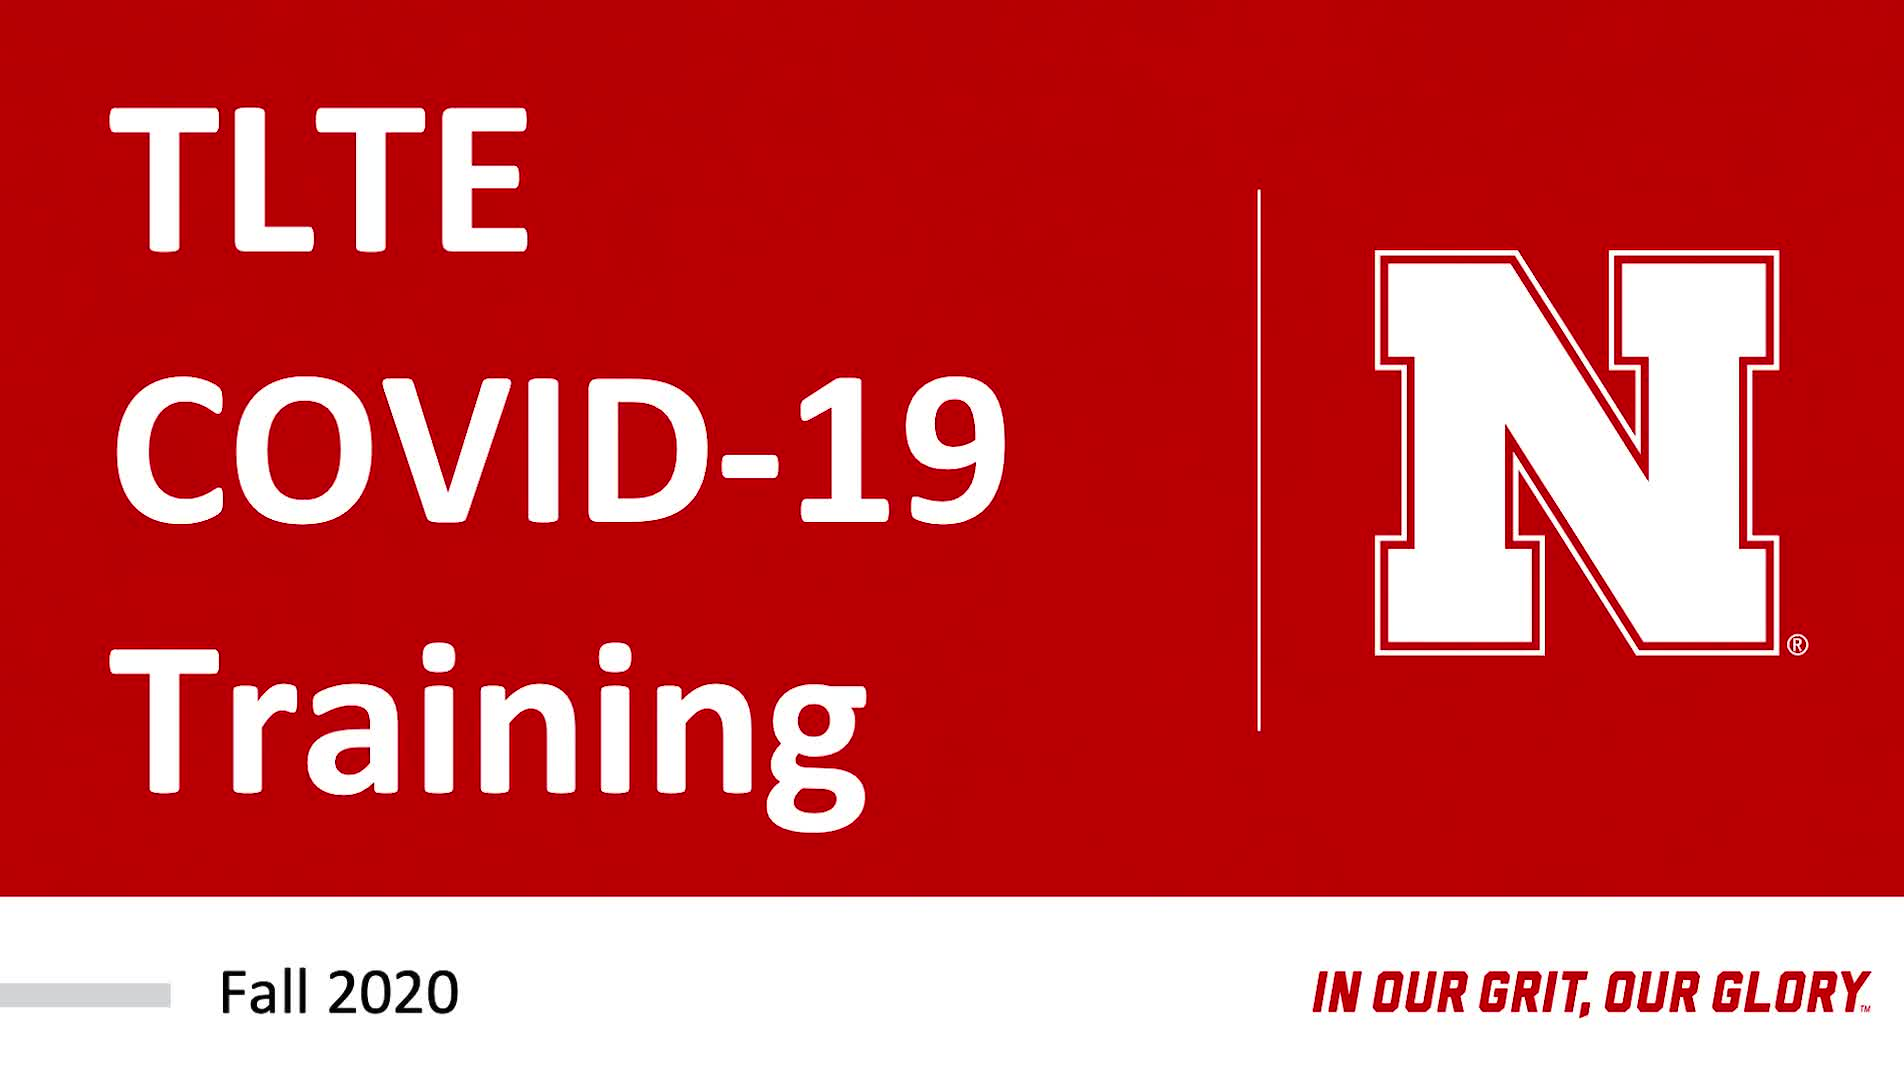 TLTE COVID-19 Training